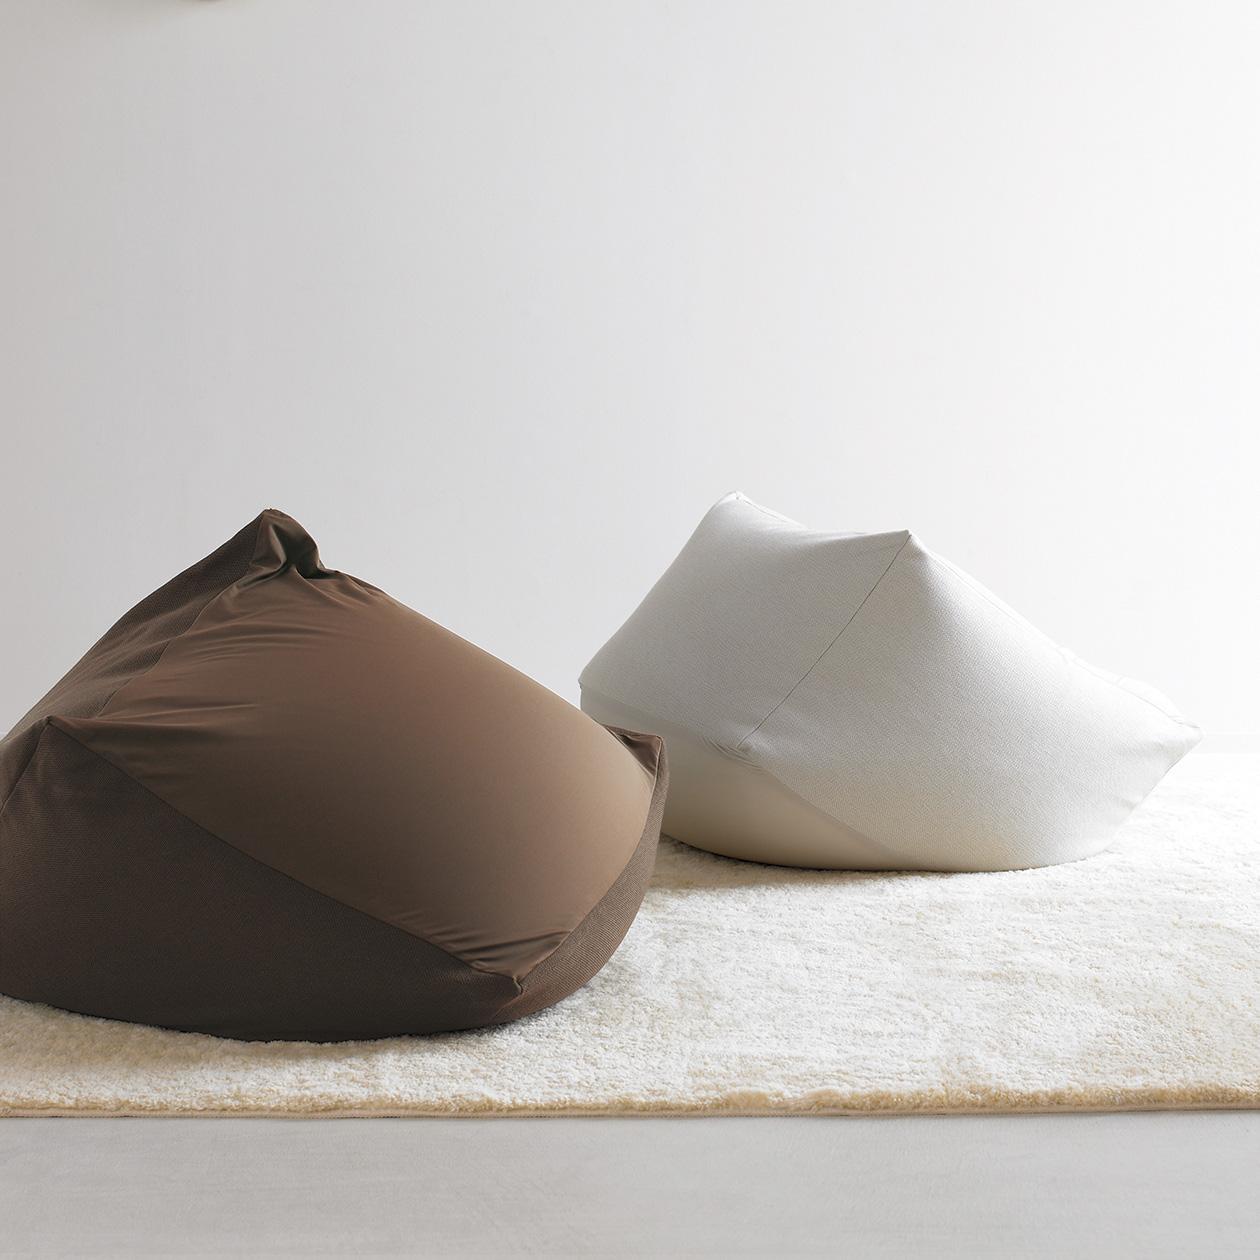 New MUJI Furniture Body Fit Cushion MUJI USA